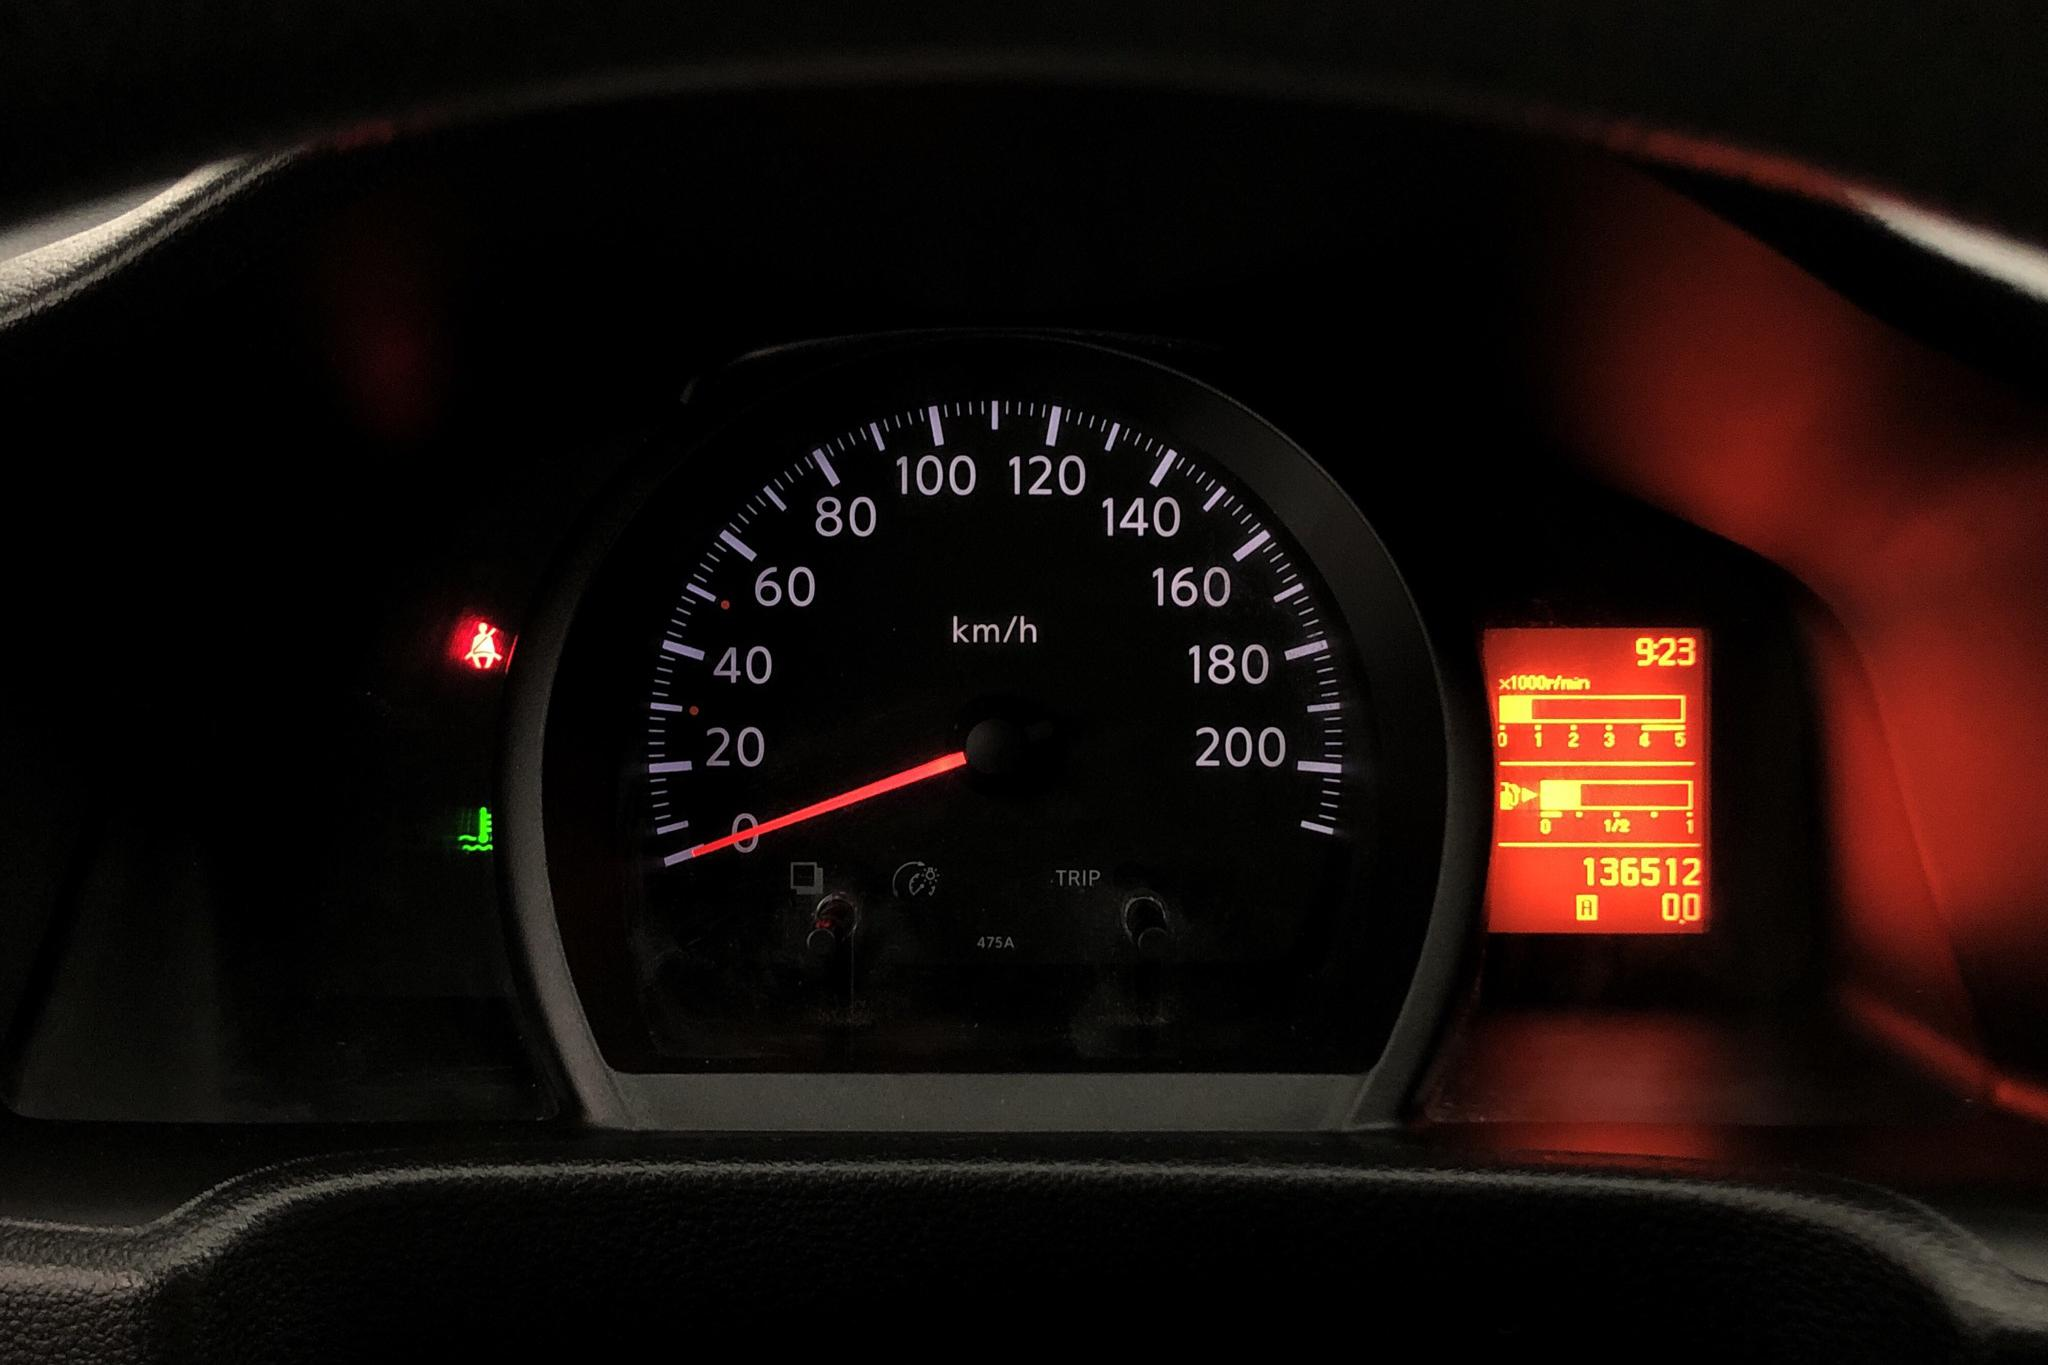 Nissan NV200 1.5 dCi Skåp (85hk) - 13 651 mil - Manuell - silver - 2011